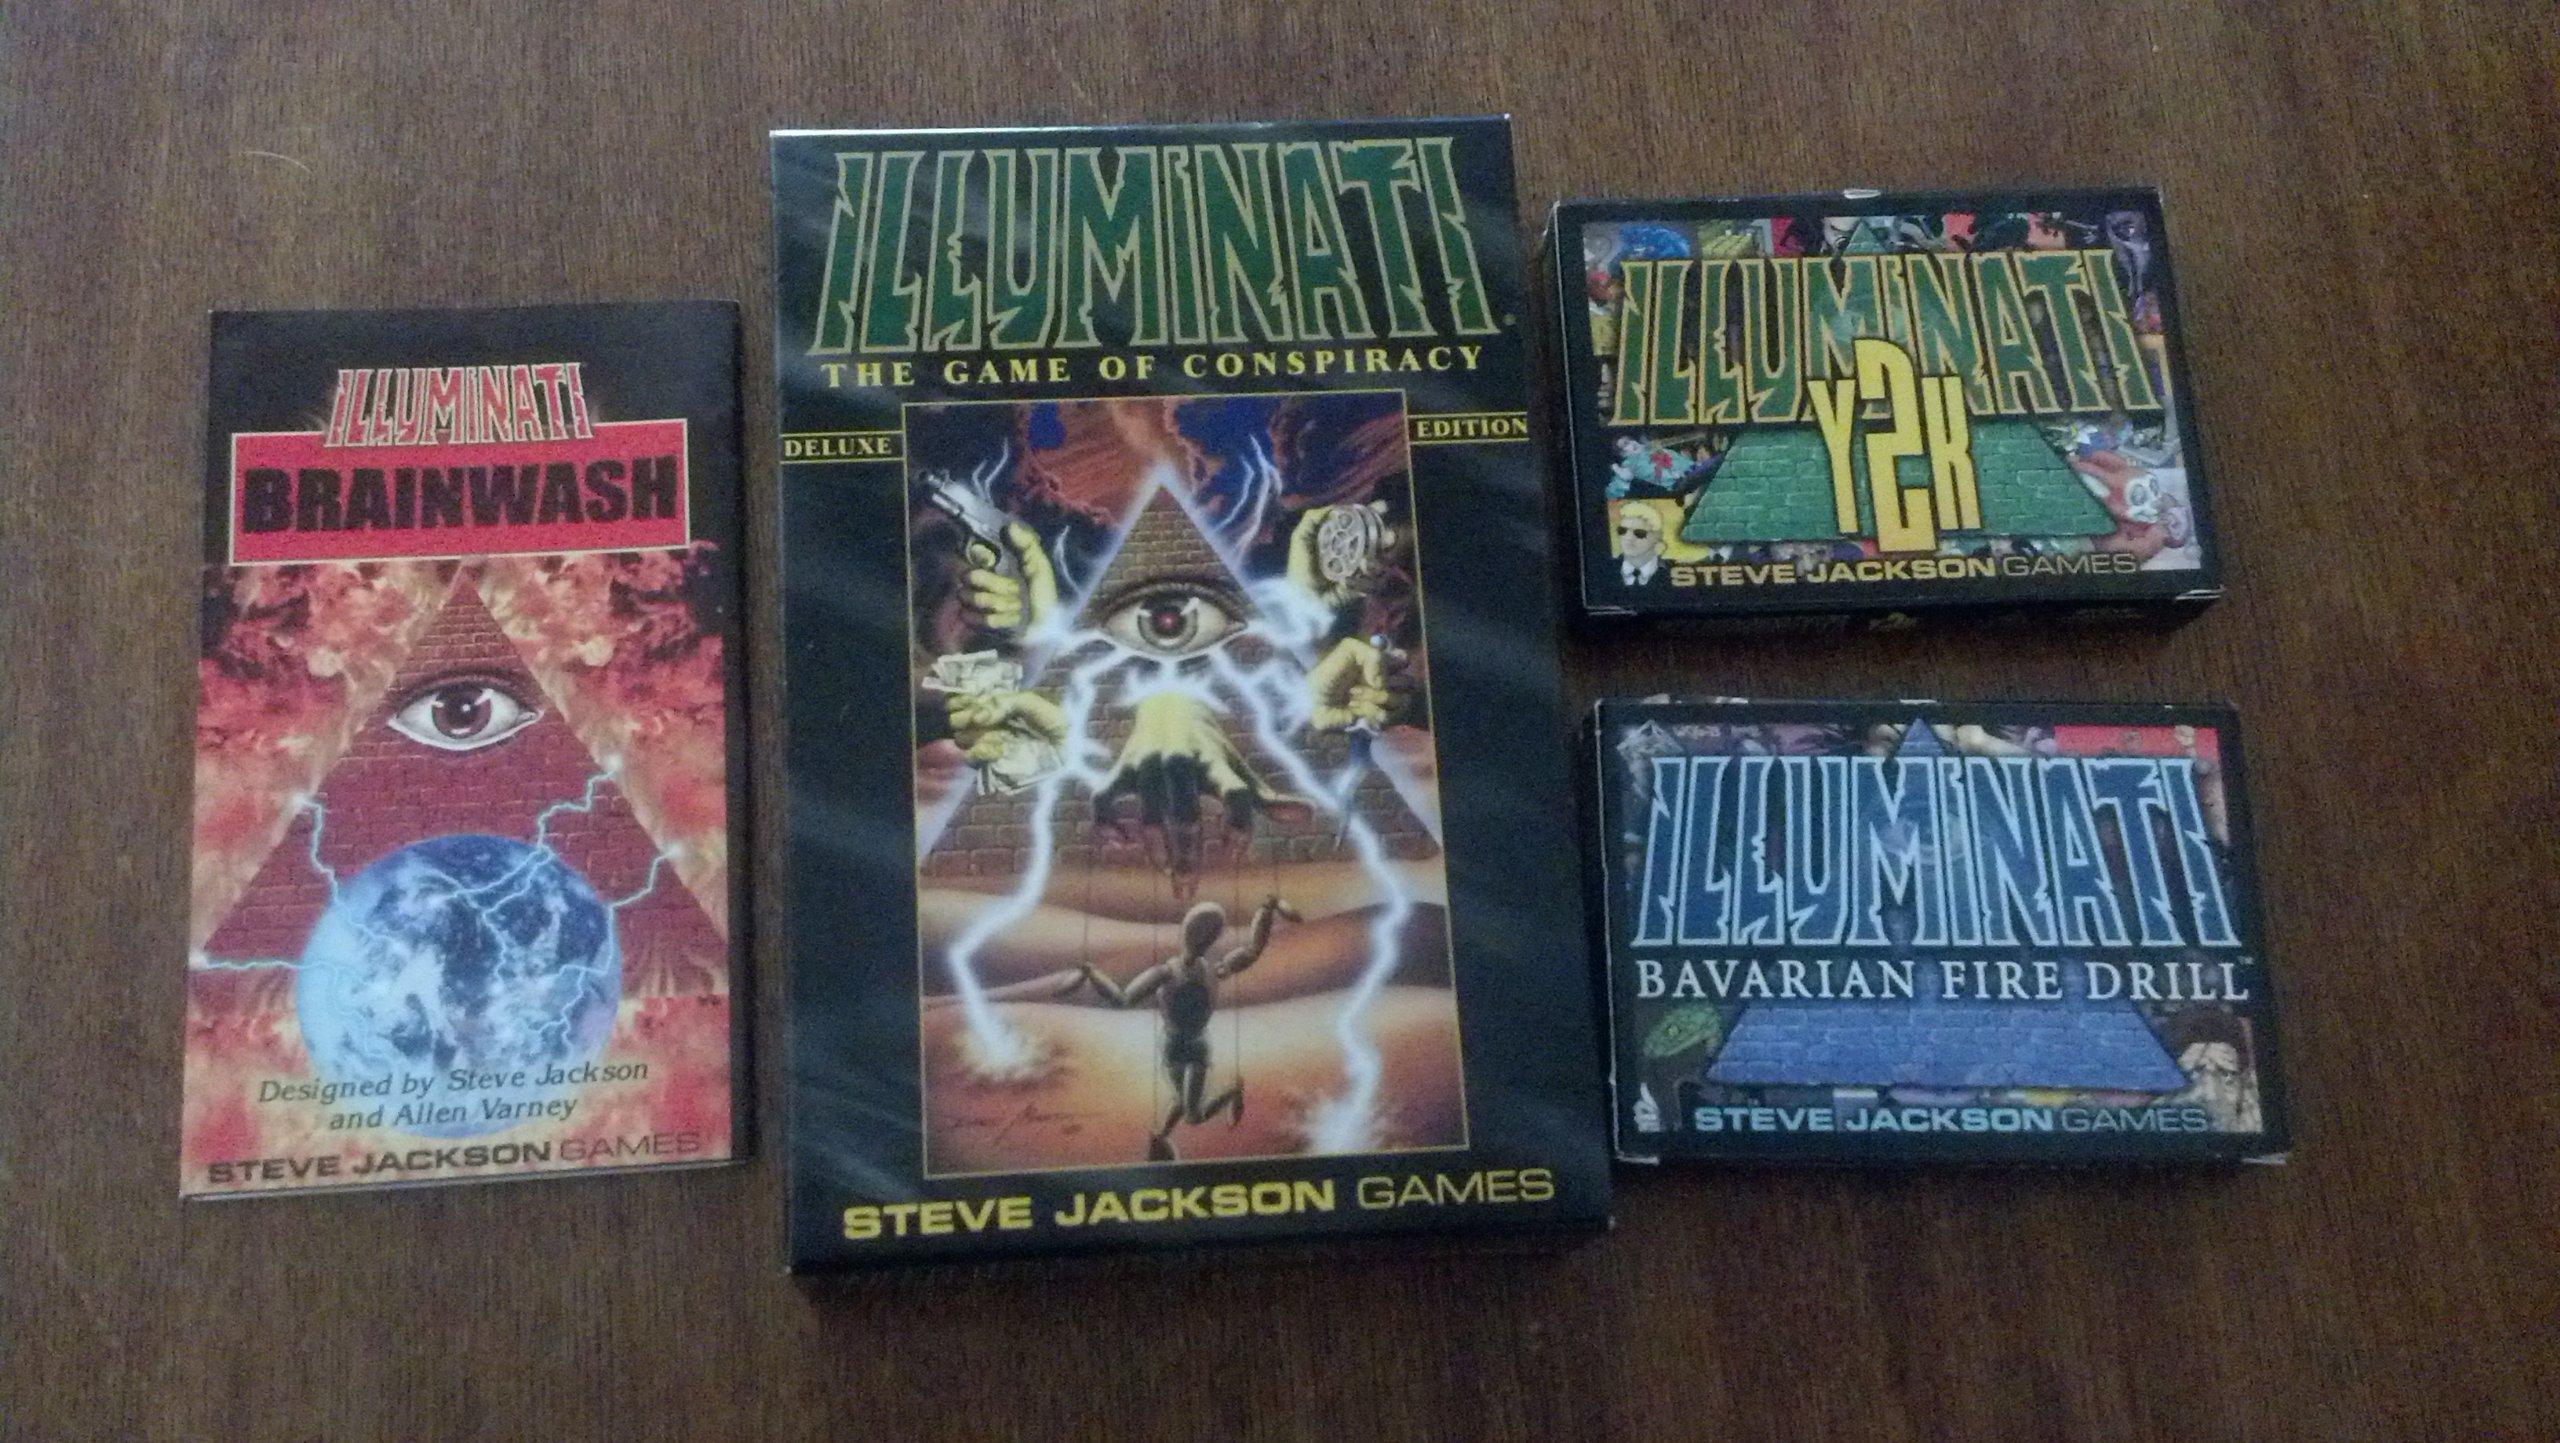 Illuminati: The Game of Conspiracy Original Plastic Case Set: Amazon.es: Steve Jackson: Libros